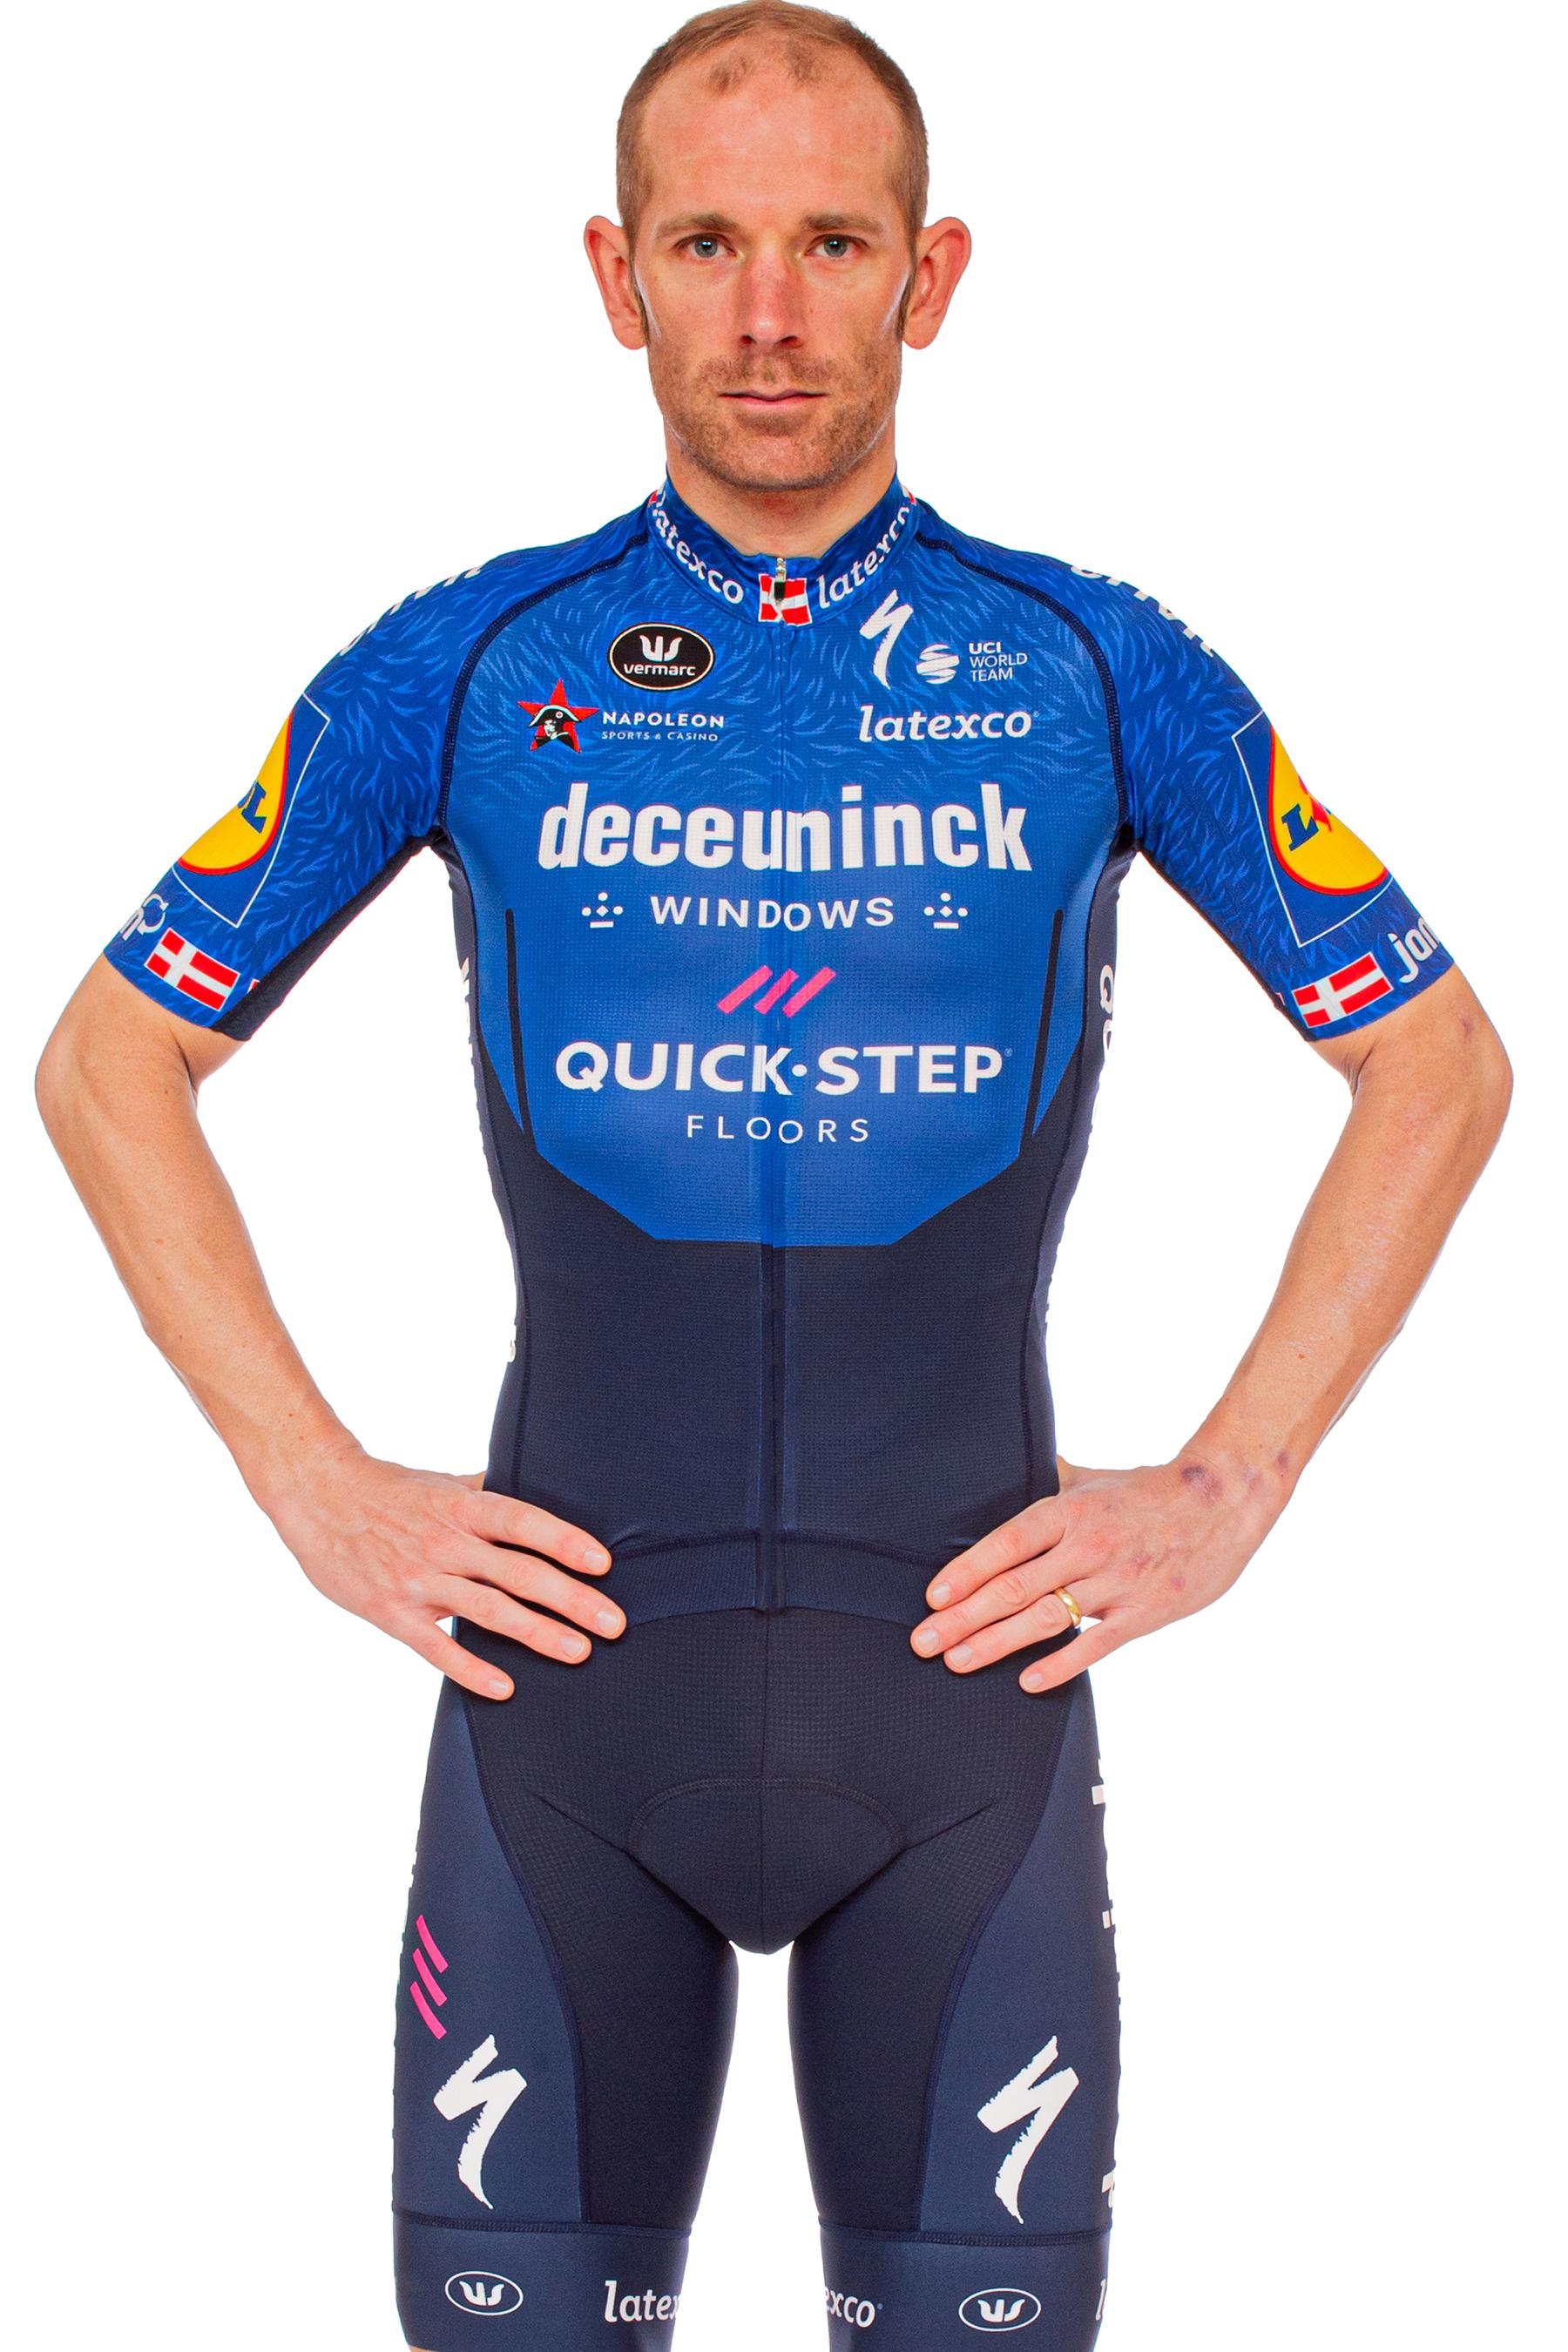 Michael Morkov Deceuninck 2021